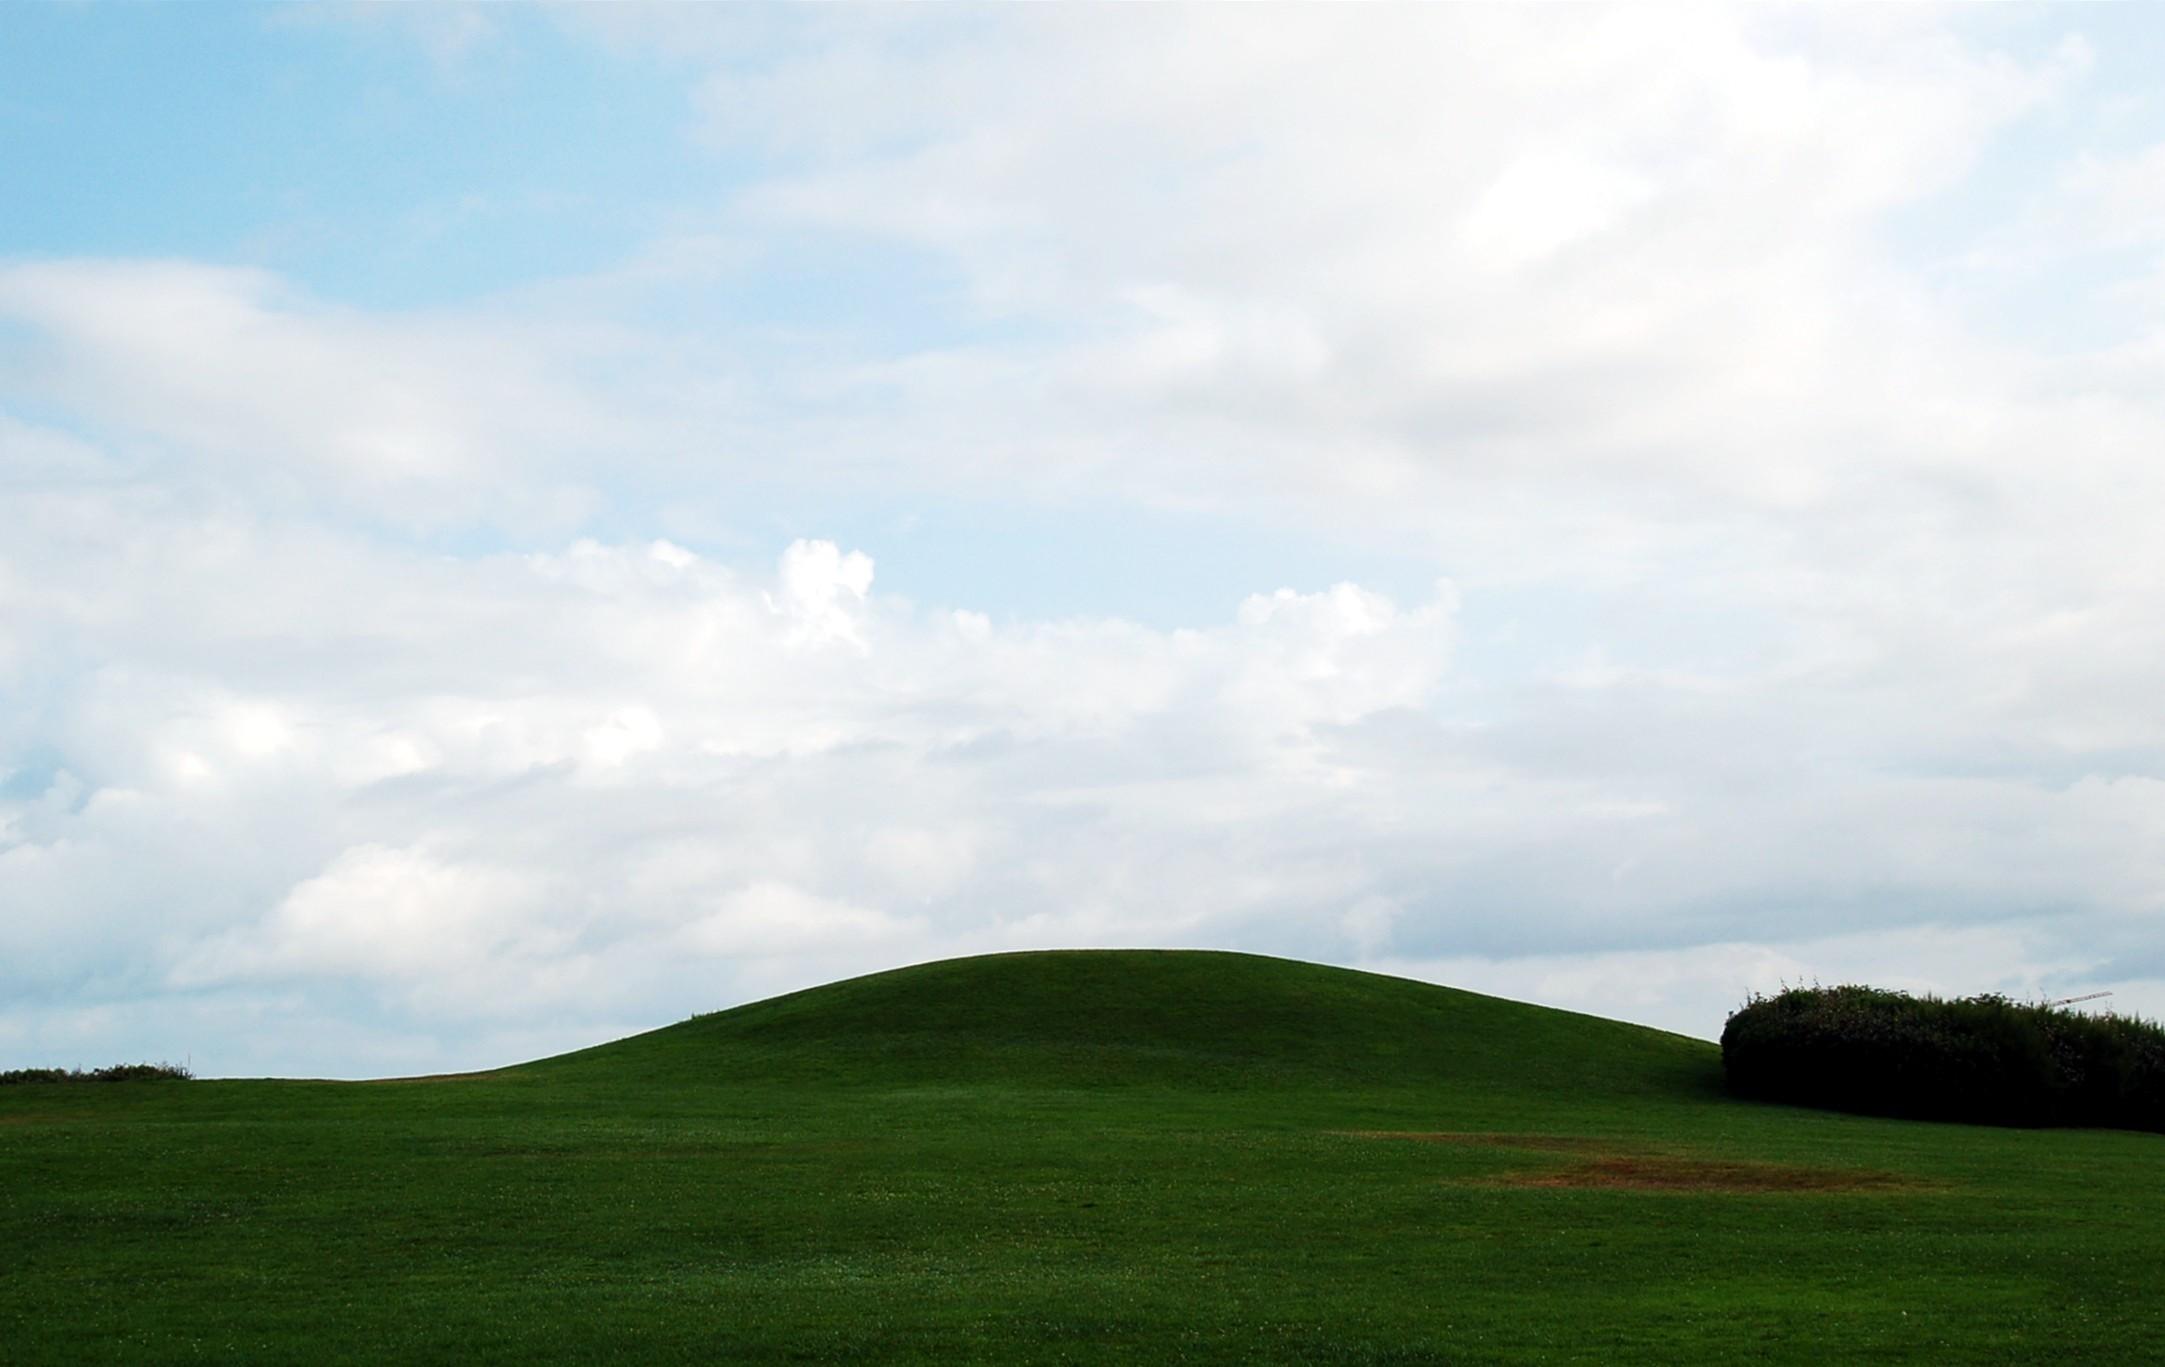 Free Images : landscape, tree, nature, grass, horizon, mountain, light,  cloud, sky, sunset, field, meadow, prairie, hill, view, green, solo, blue,  plain, …